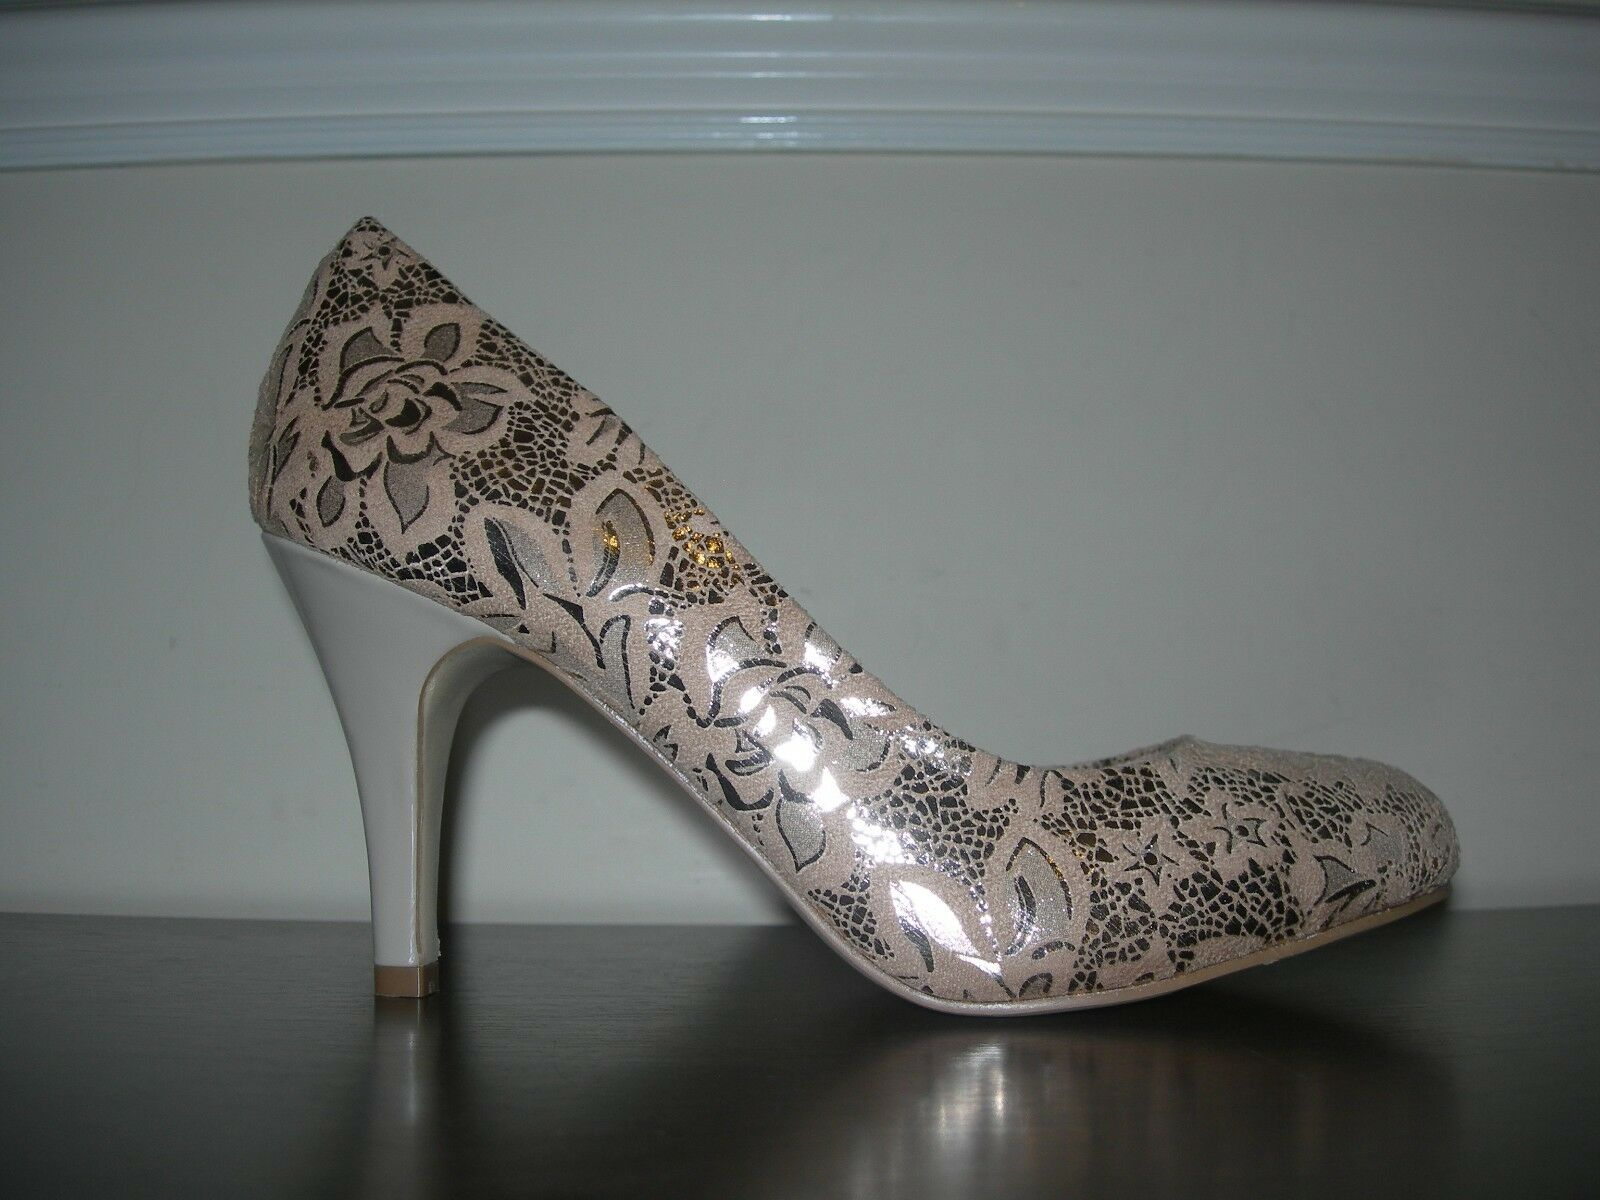 LOTUS WOMEN'S COURT PATTERN Schuhe HEELS GOLDEN FLORAL PATTERN COURT ELEGANT CHIC EU 38 / UK 5 10475e